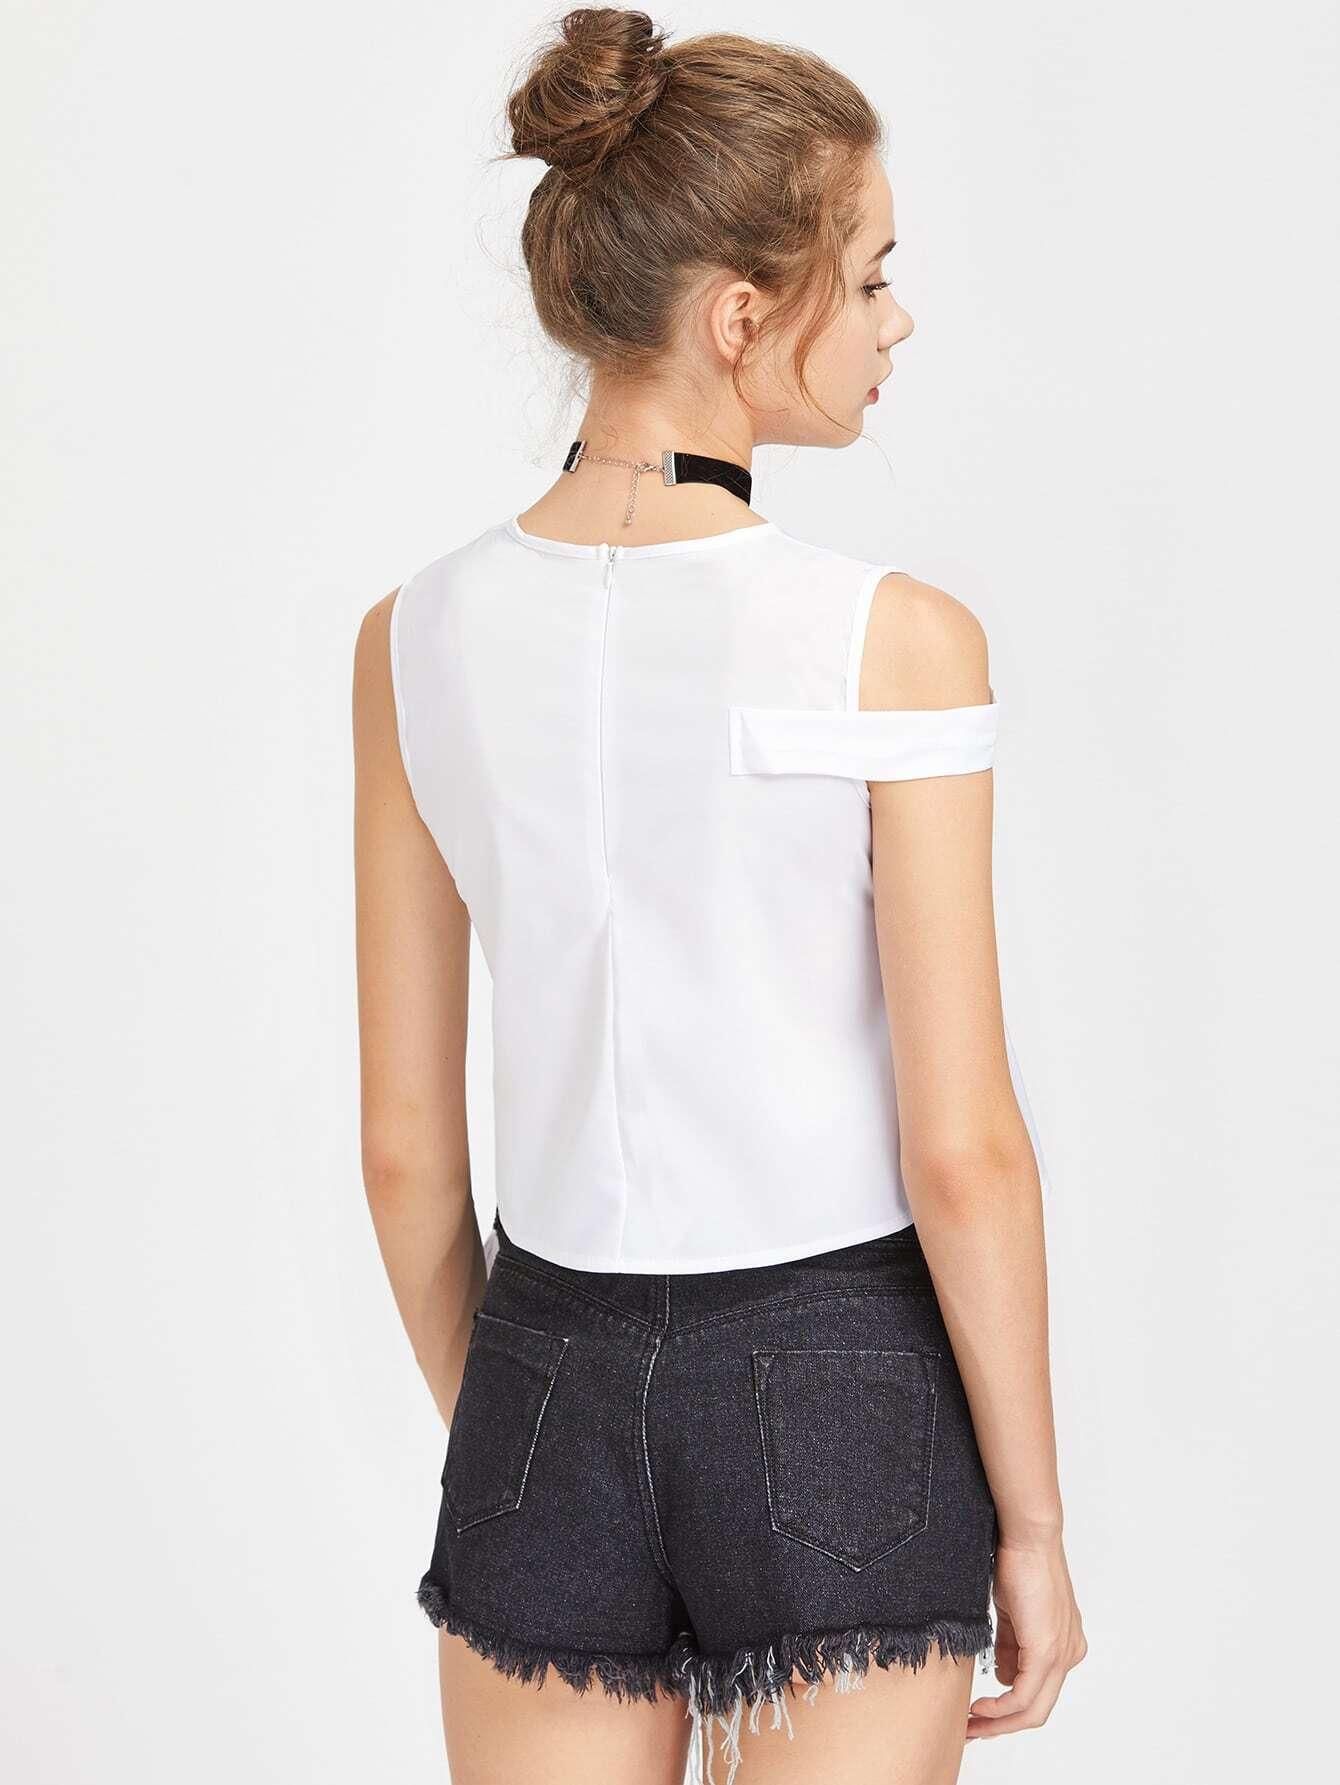 blouse170413009_2